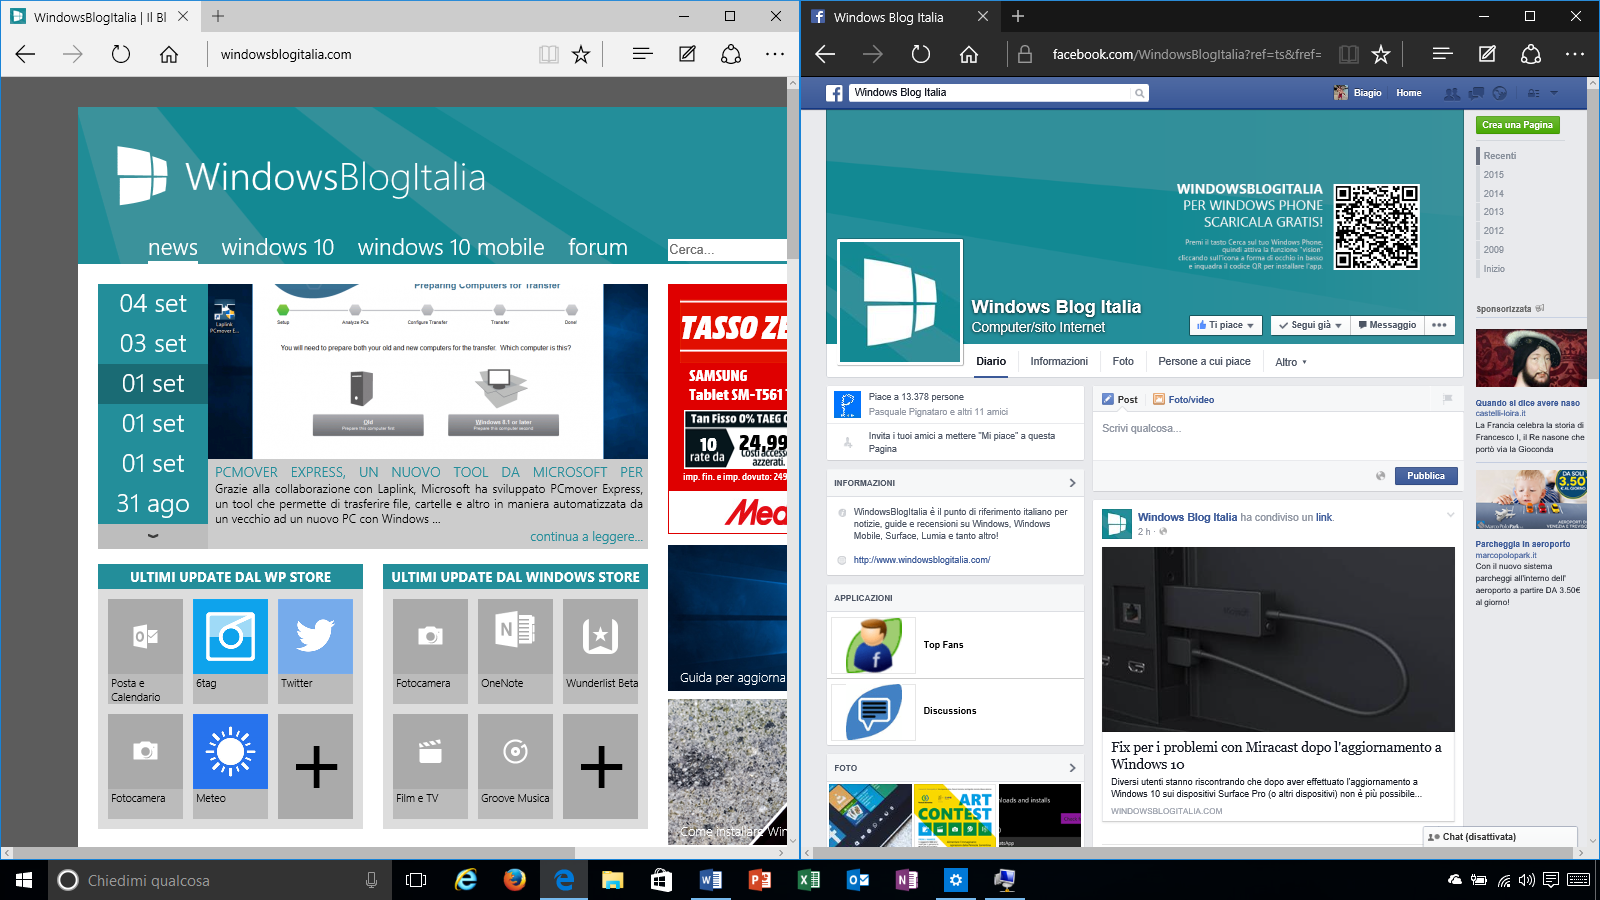 MicrosoftEdge-8